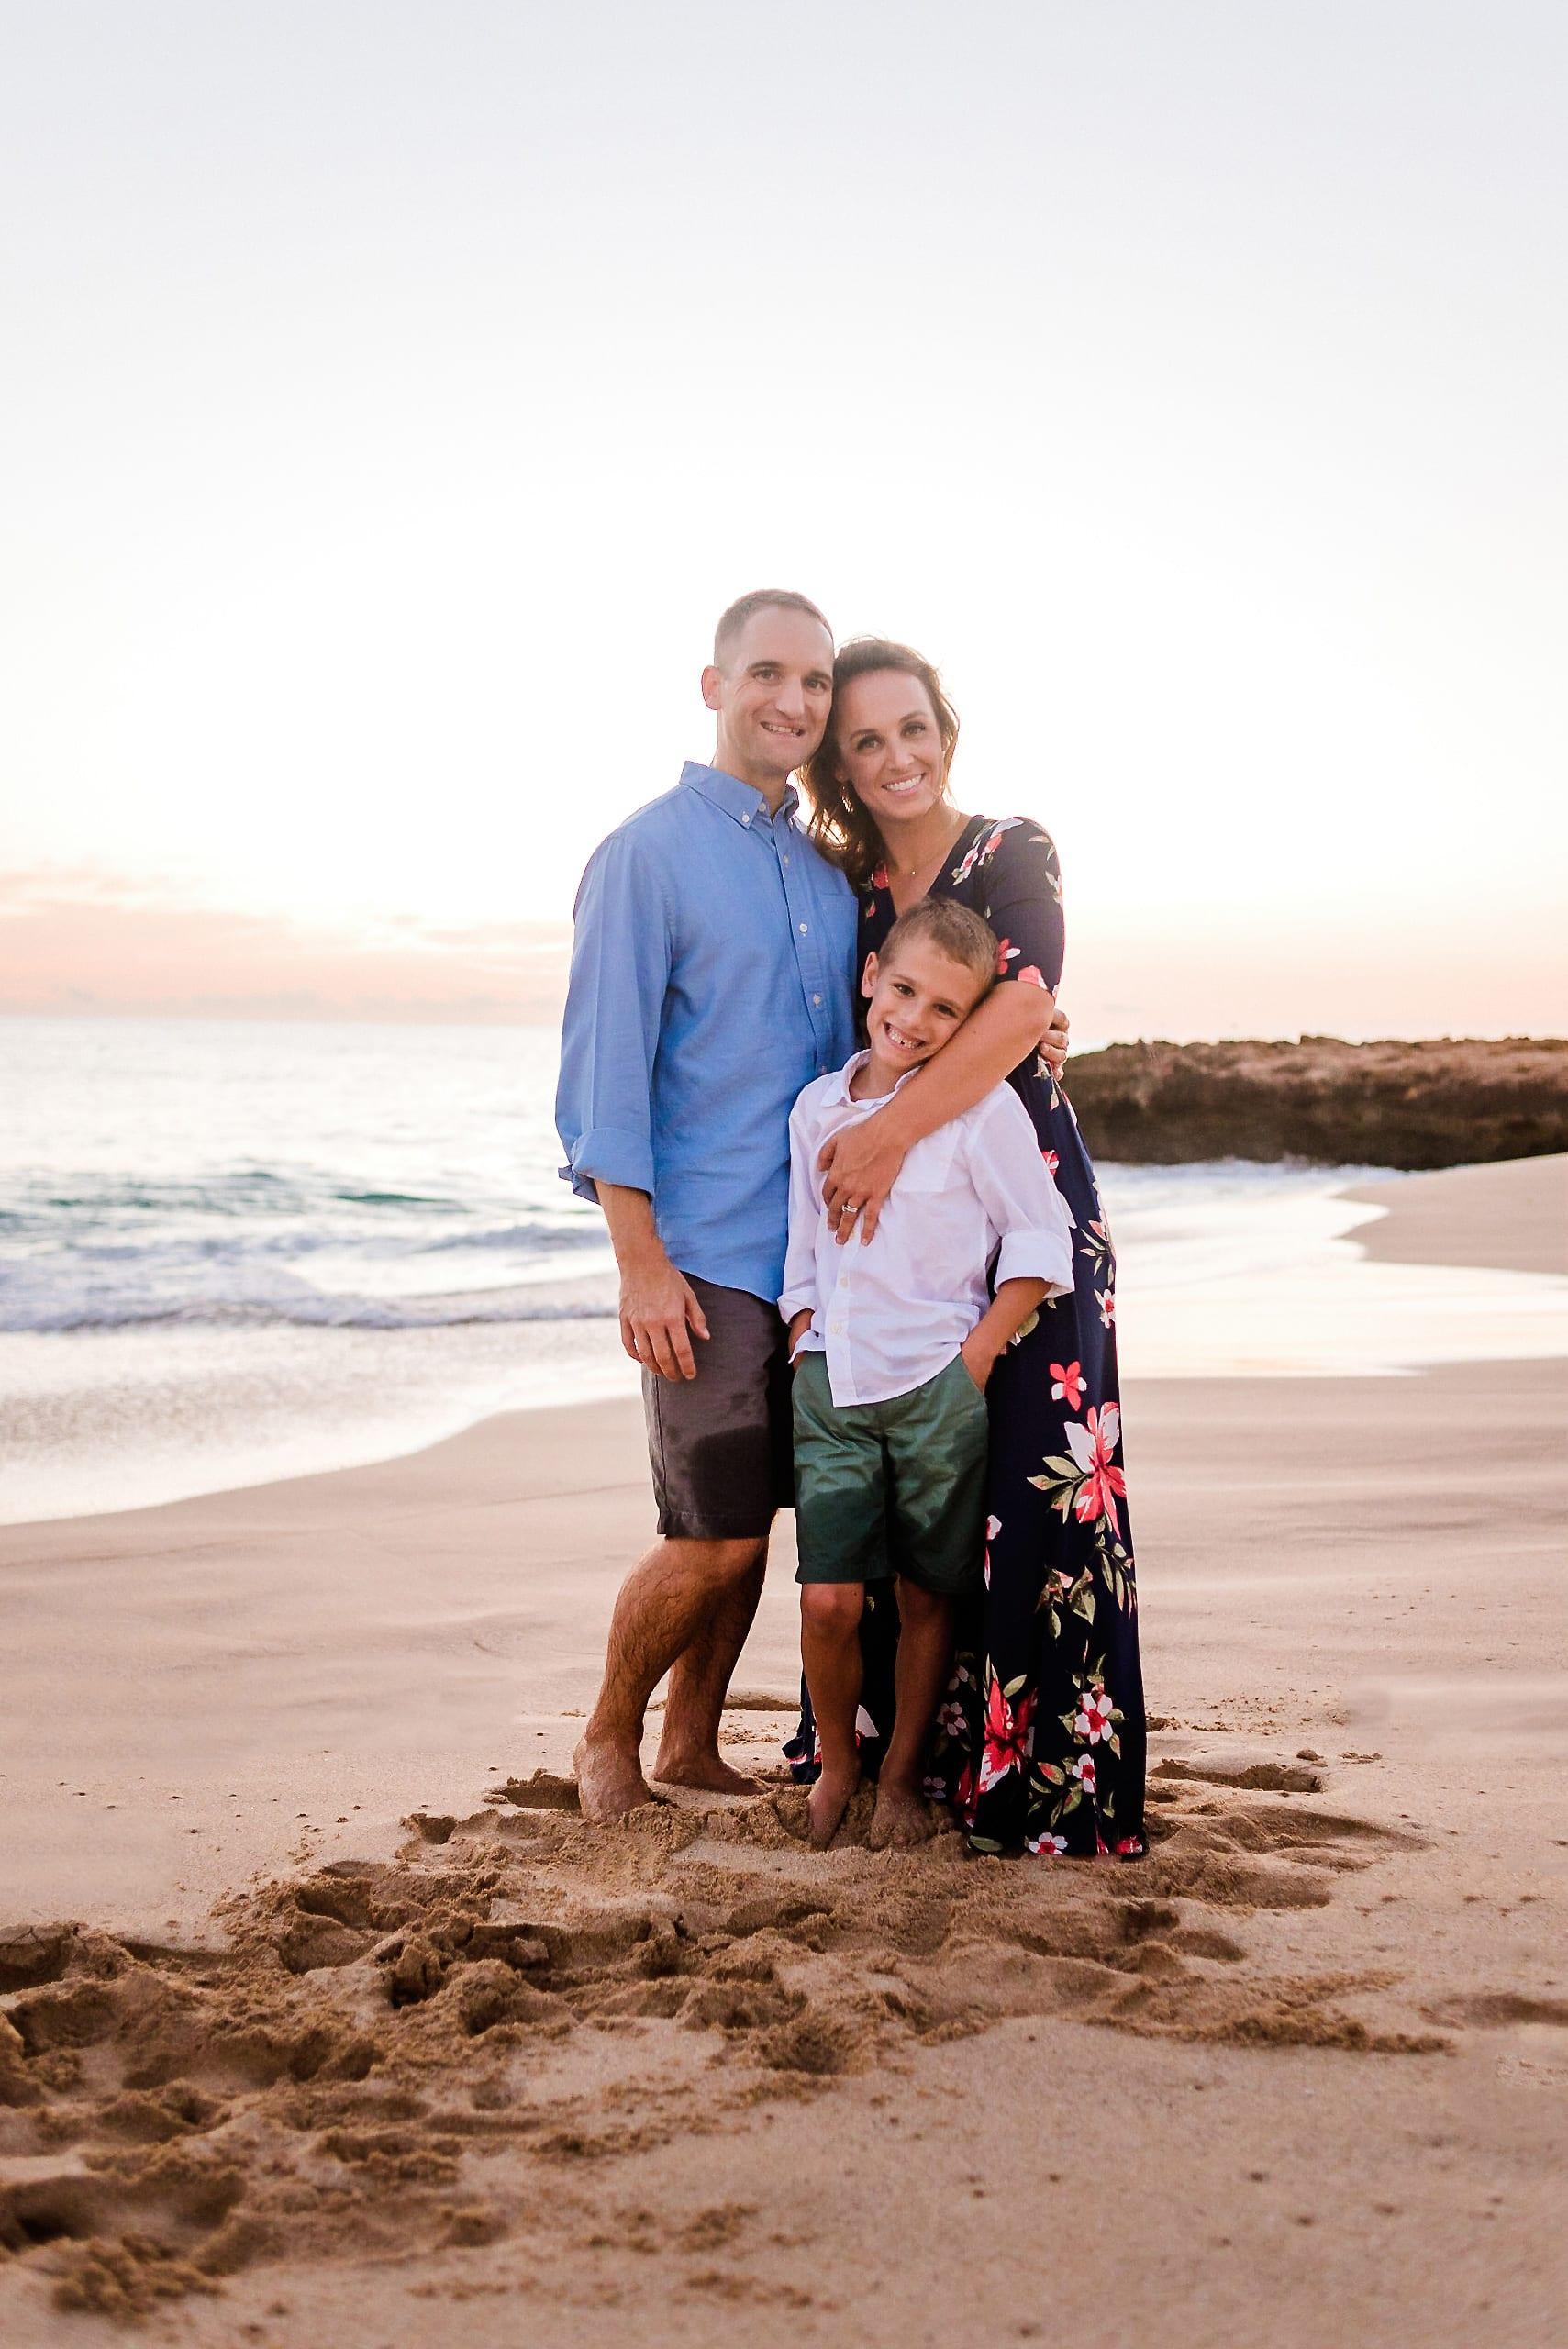 Big-Island-Best-Family-Photographer-Beach-Sunset-16.jpg